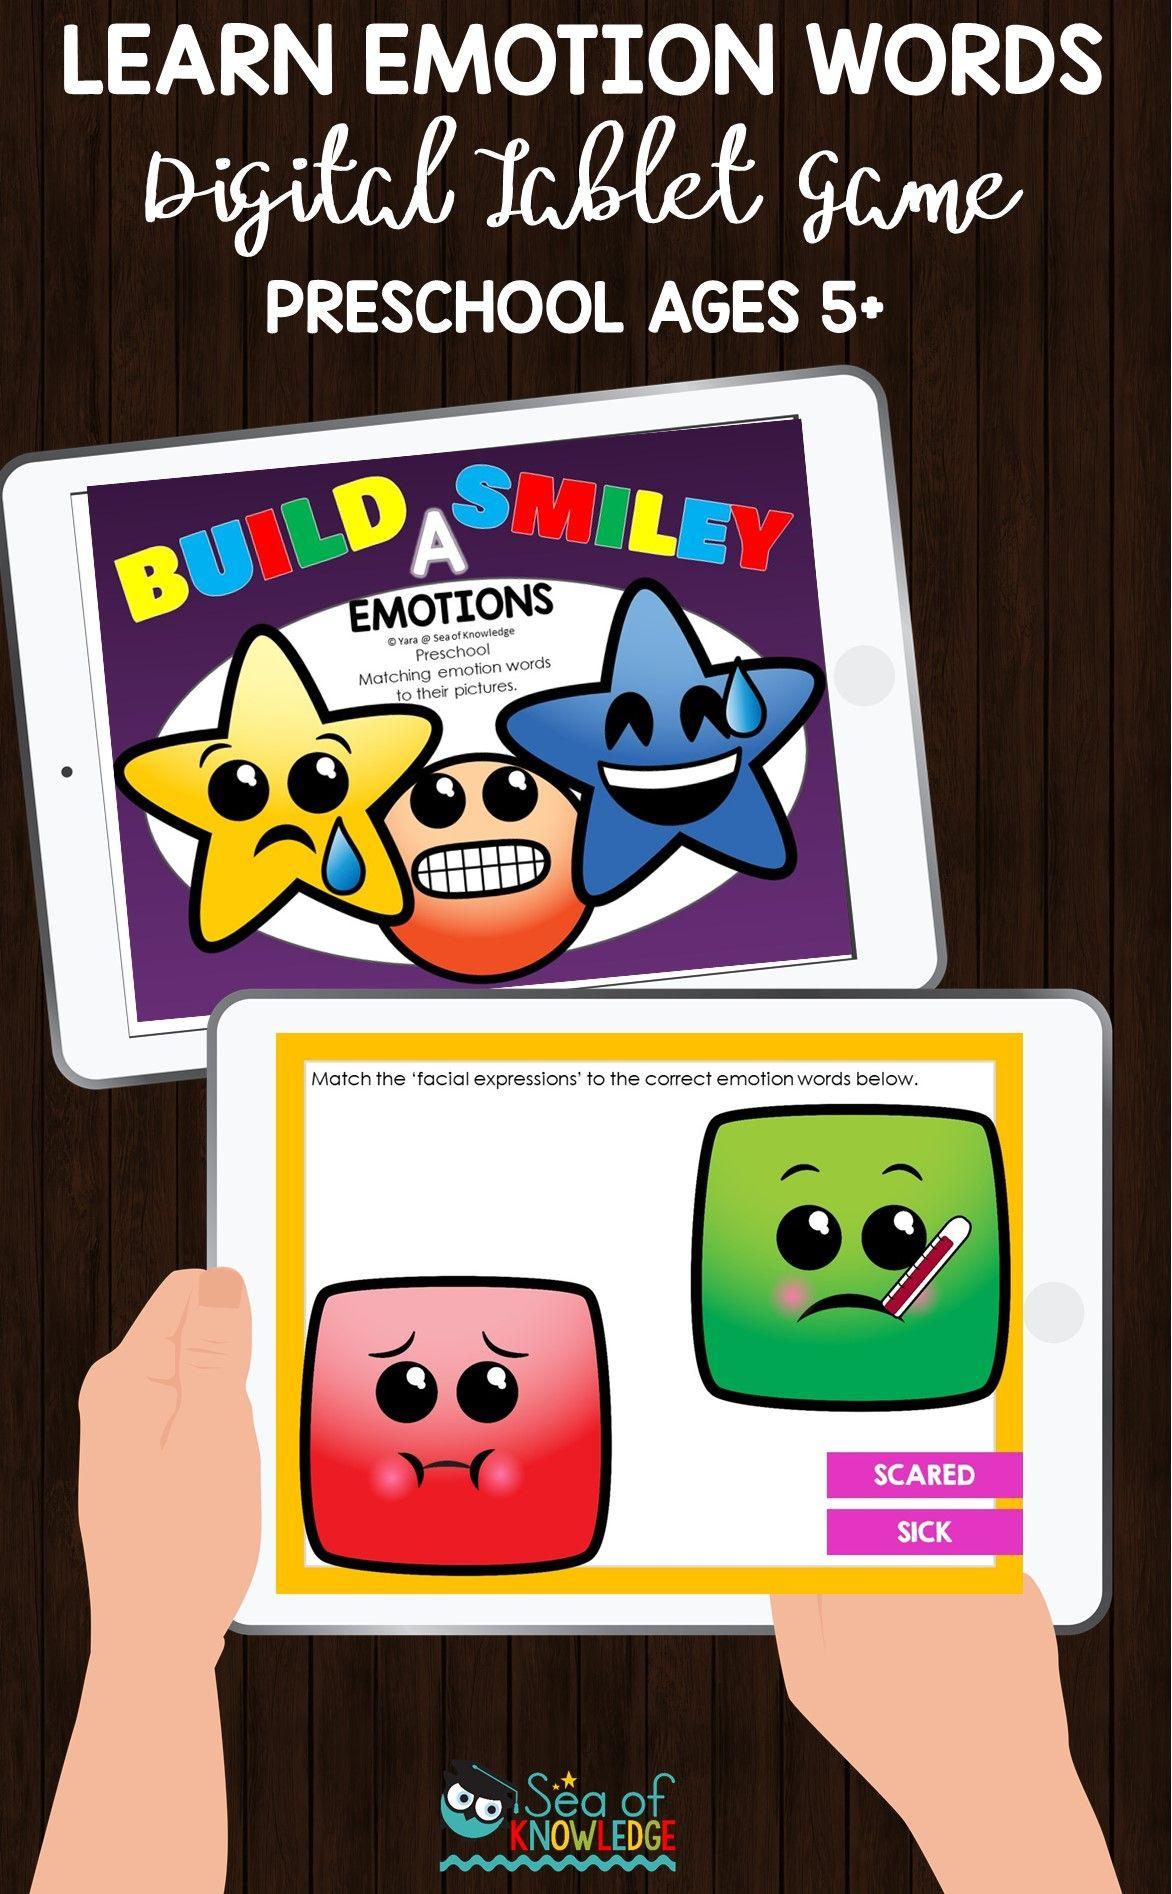 Tablet Games for Kids Preschool games, Preschool age